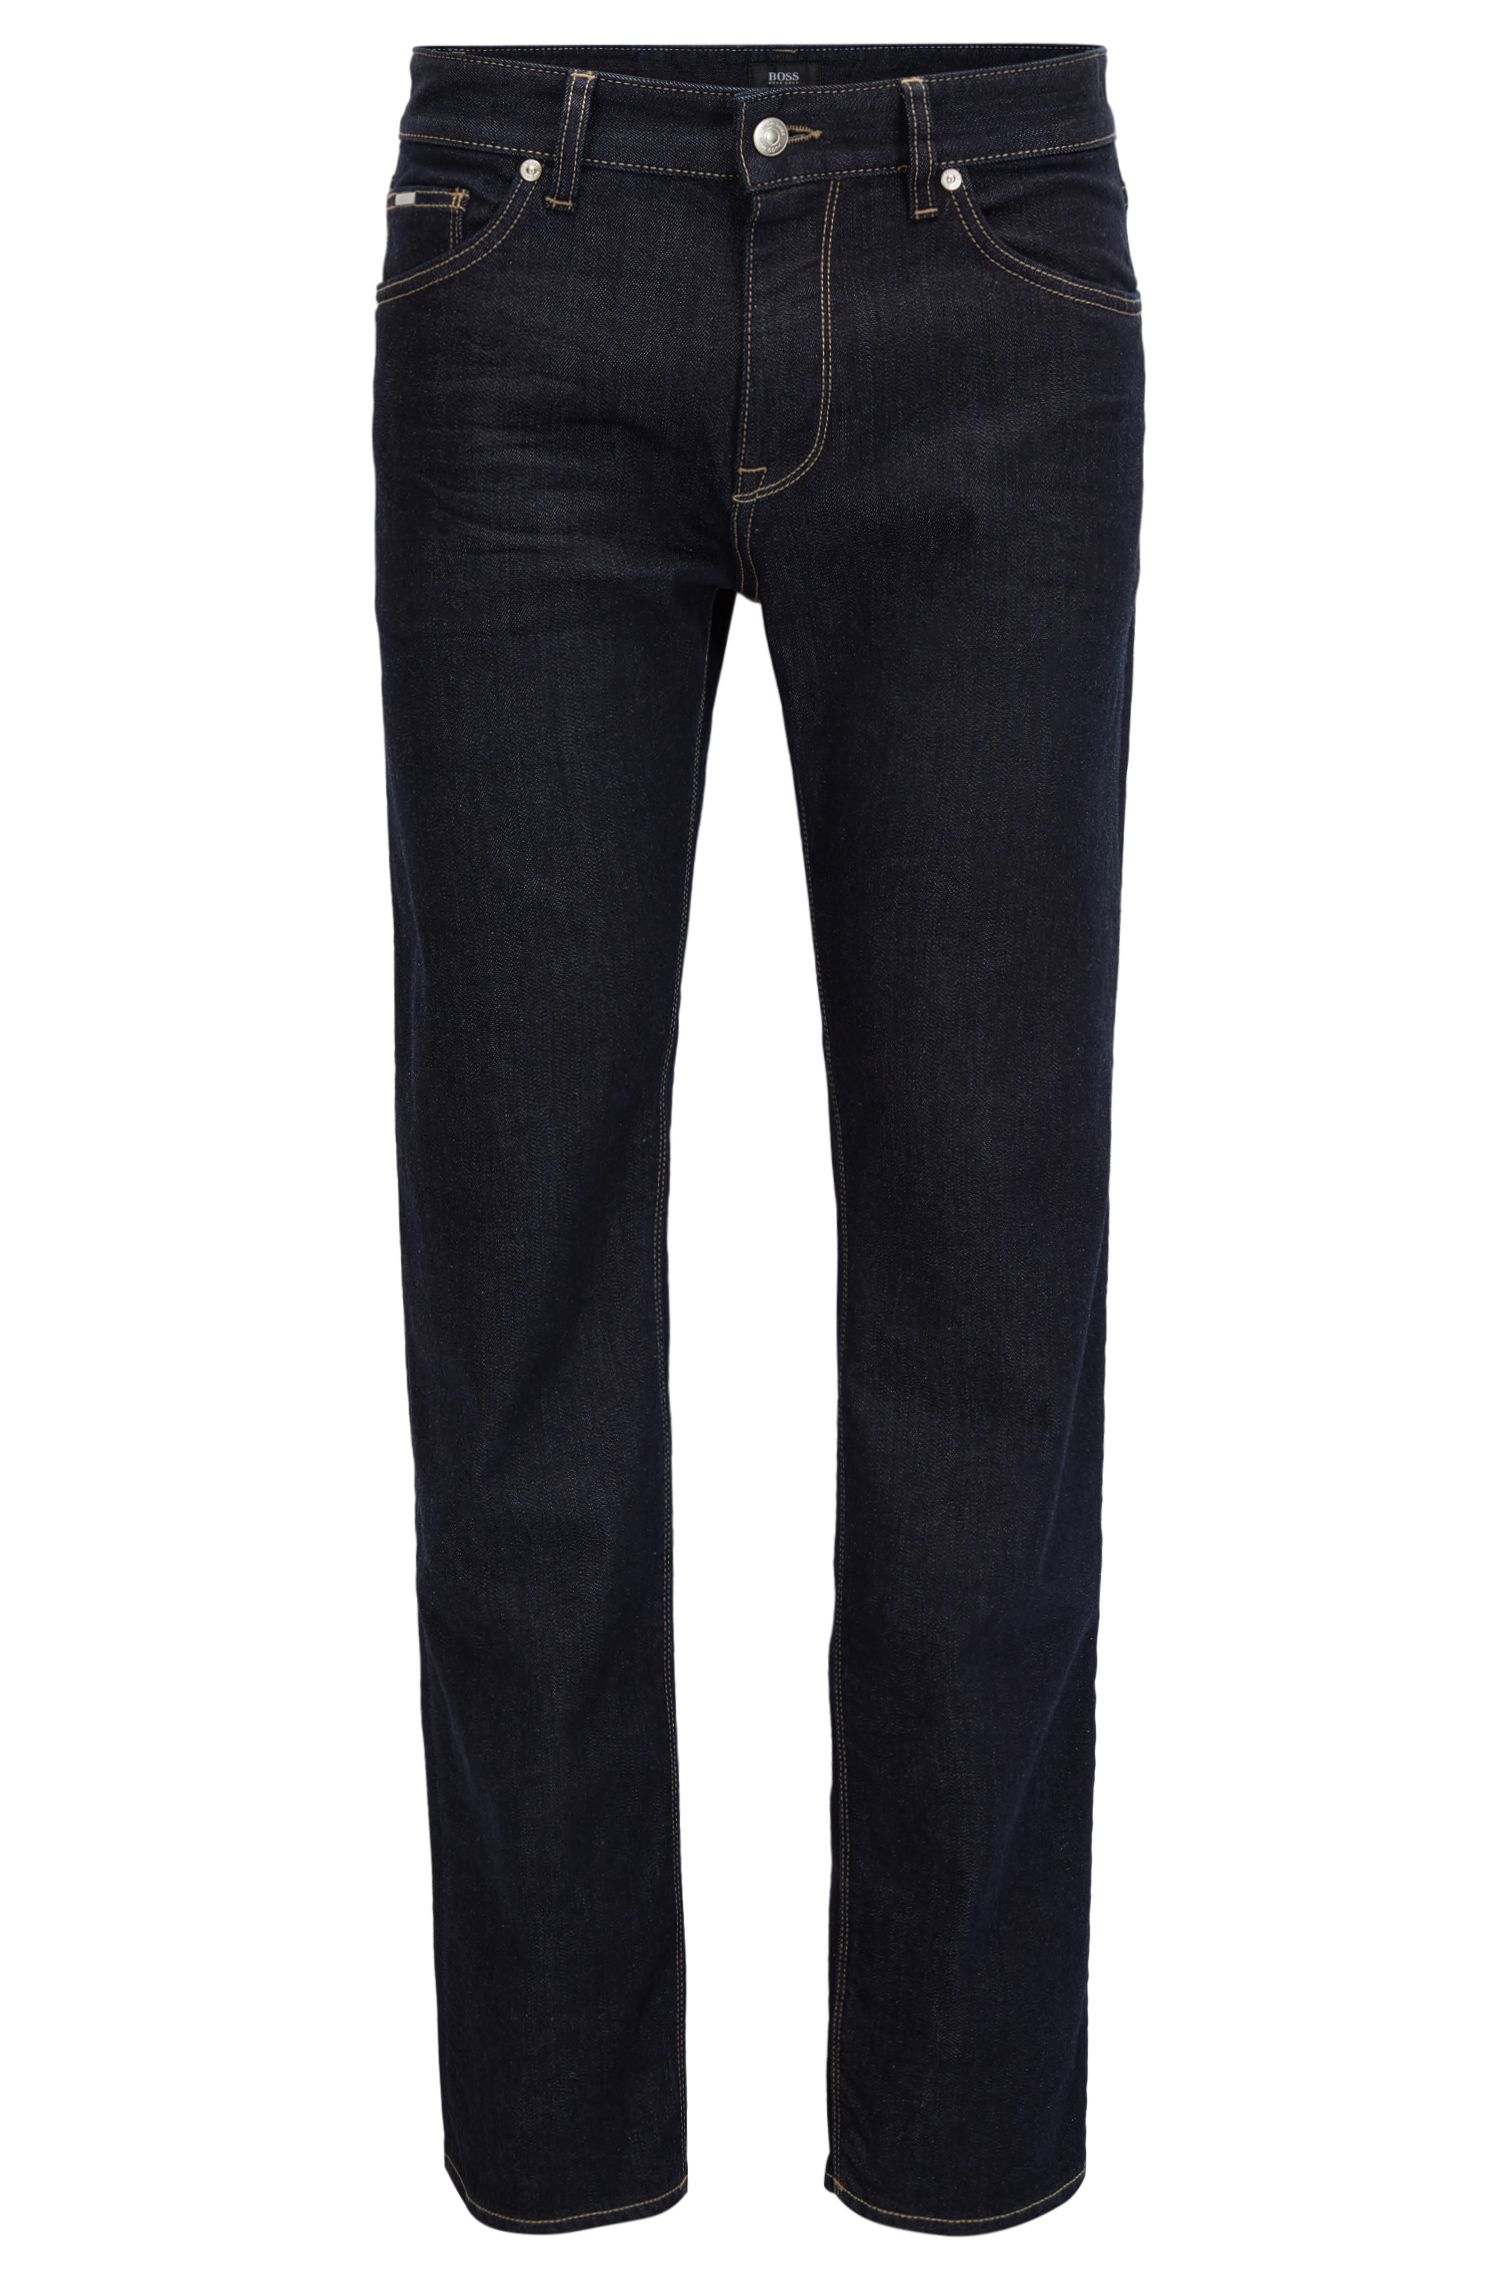 Regular-Fit Jeans aus komfortablem Baumwoll-Mix mit Elasthan, Dunkelblau